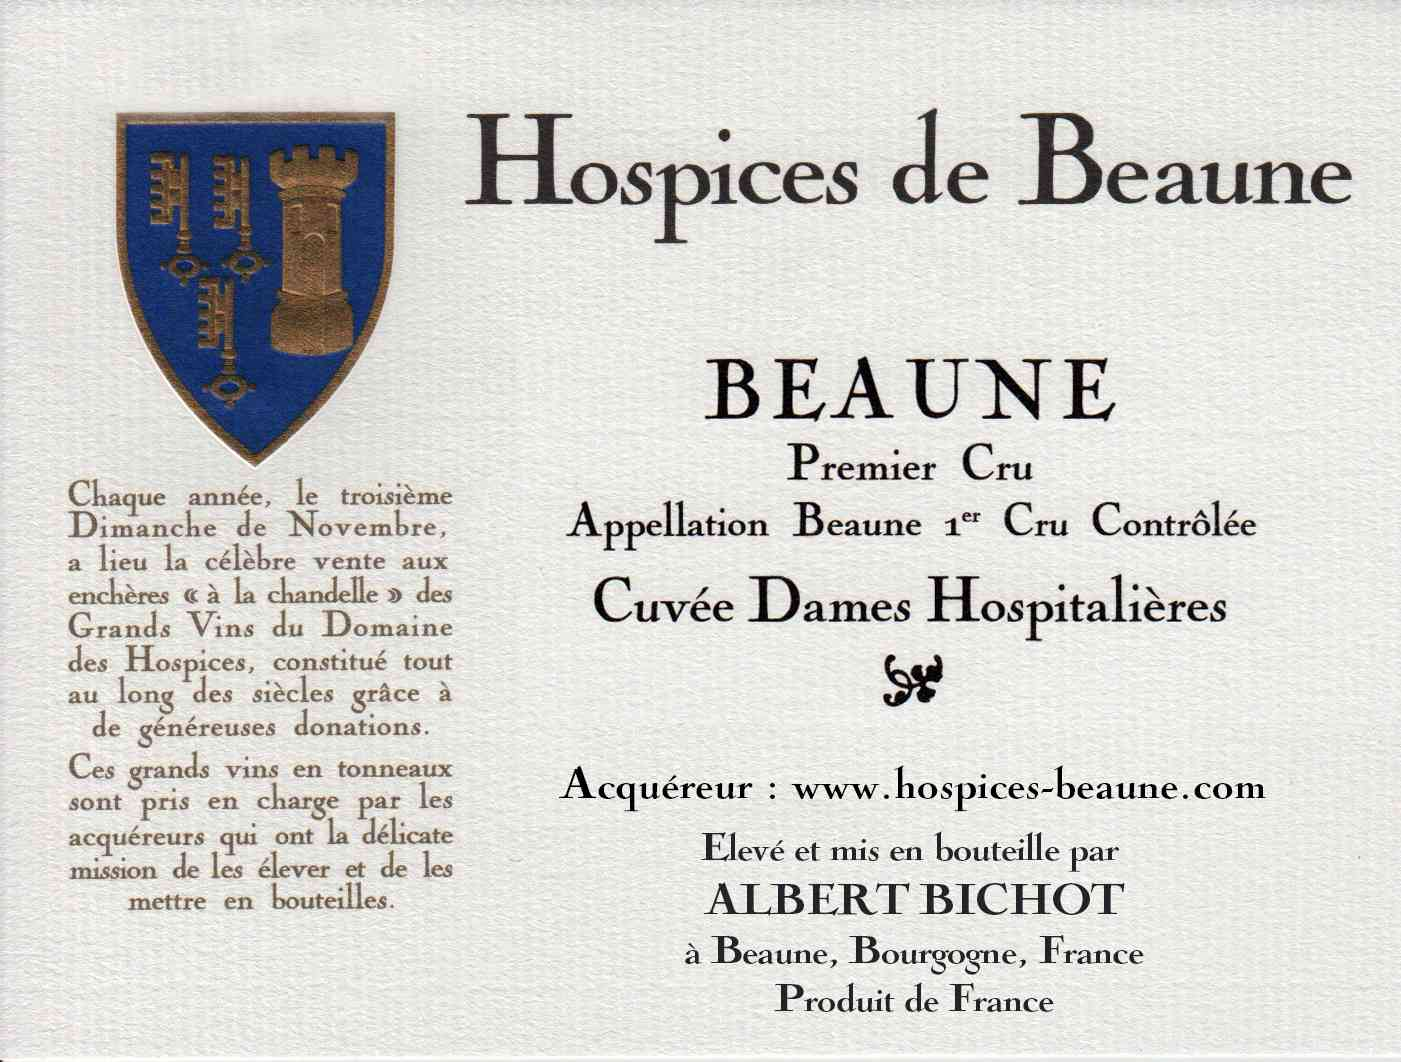 Encheres-auction-HospicesdeBeaune-AlbertBichot-Beaune1erCru-Cuvee-DamesHospitalieres